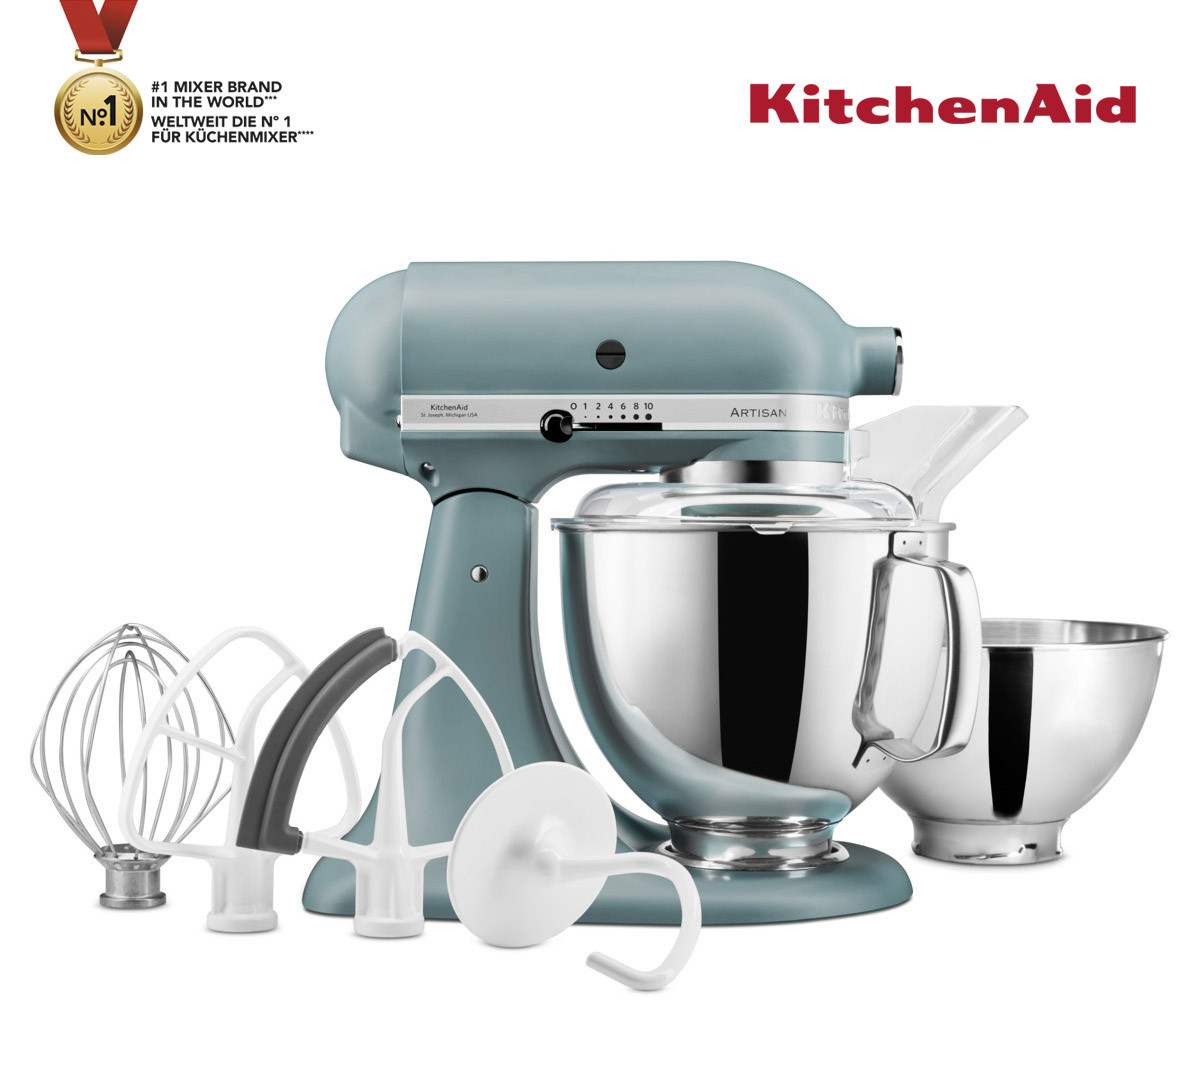 KitchenAid Küchenmaschine 175PSEMF NEUE FARBE